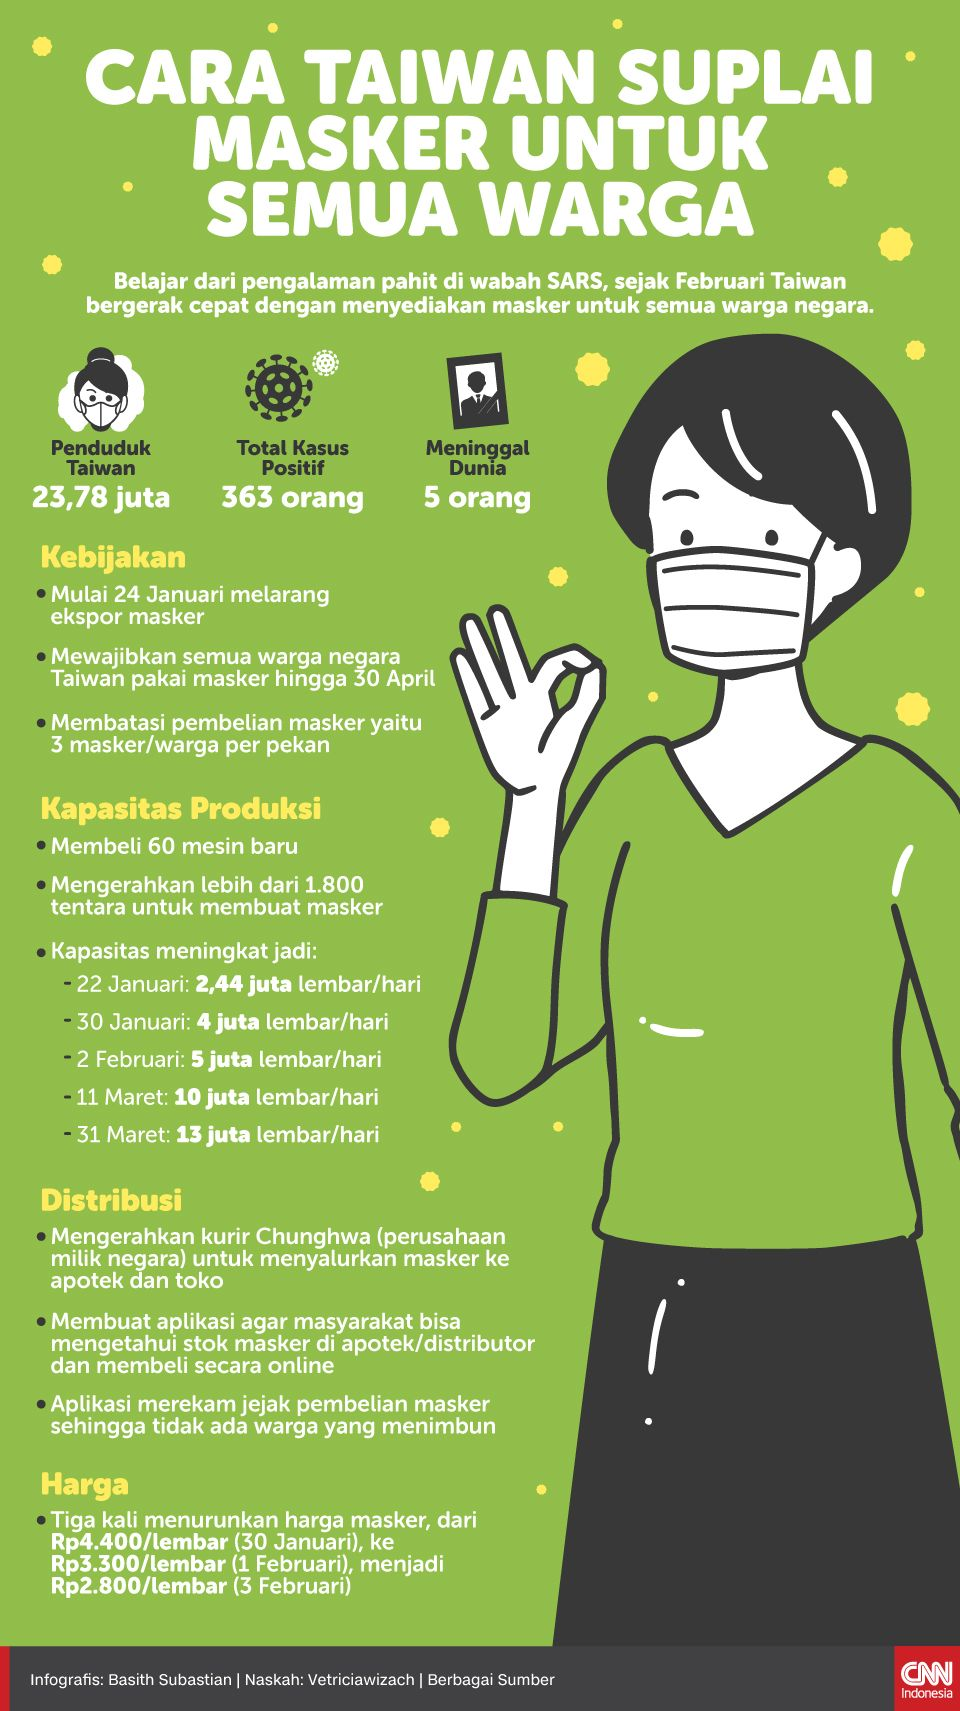 Infografis Cara Taiwan Suplai Masker untuk Semua Warga